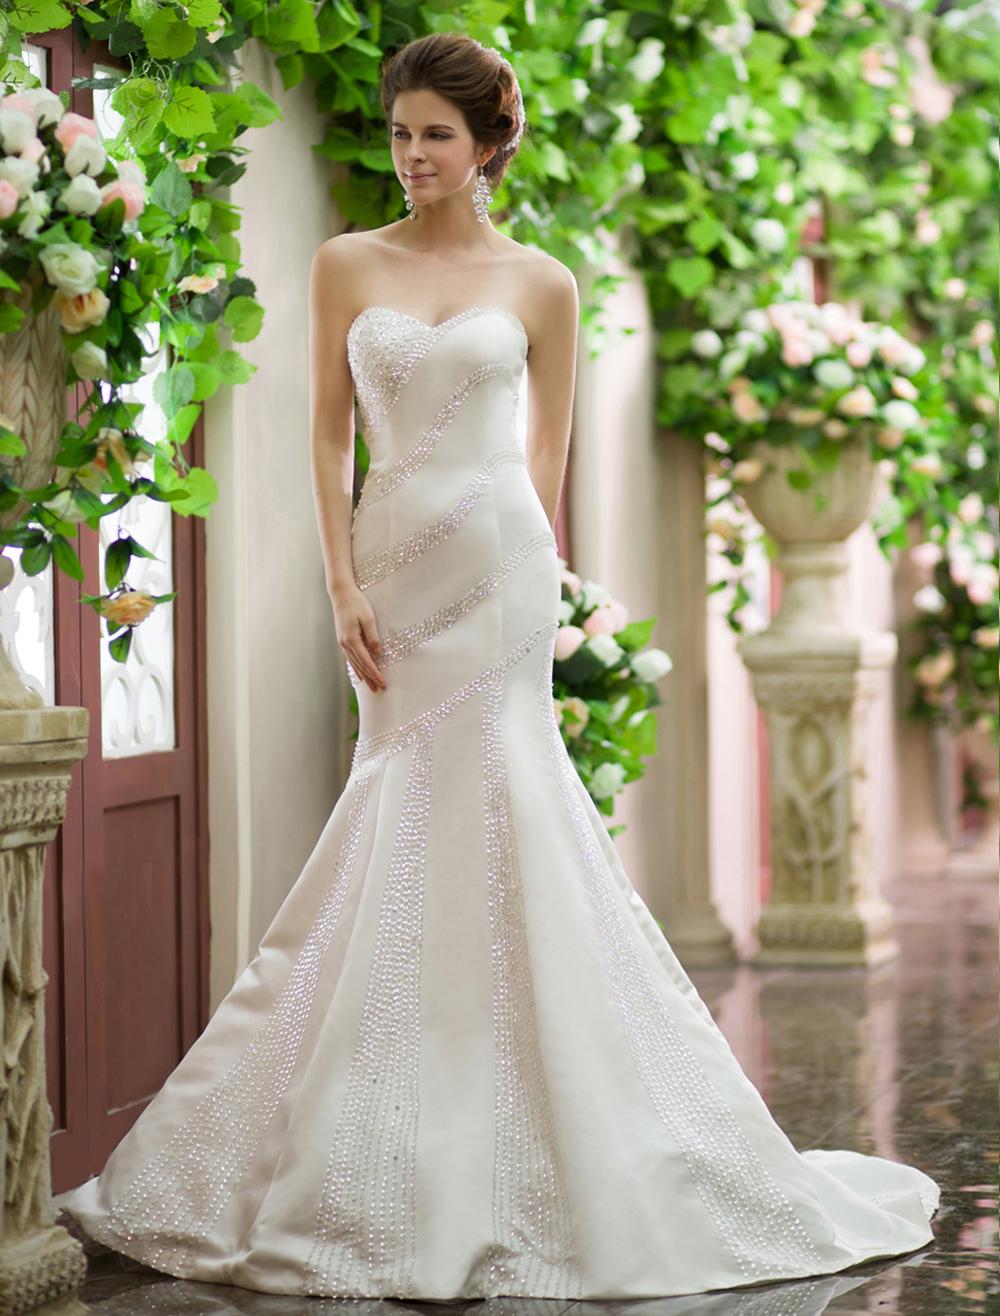 Ivory Mermaid Sweetheart Zipper Beading Sweep Bridal Wedding Gown Milanoo